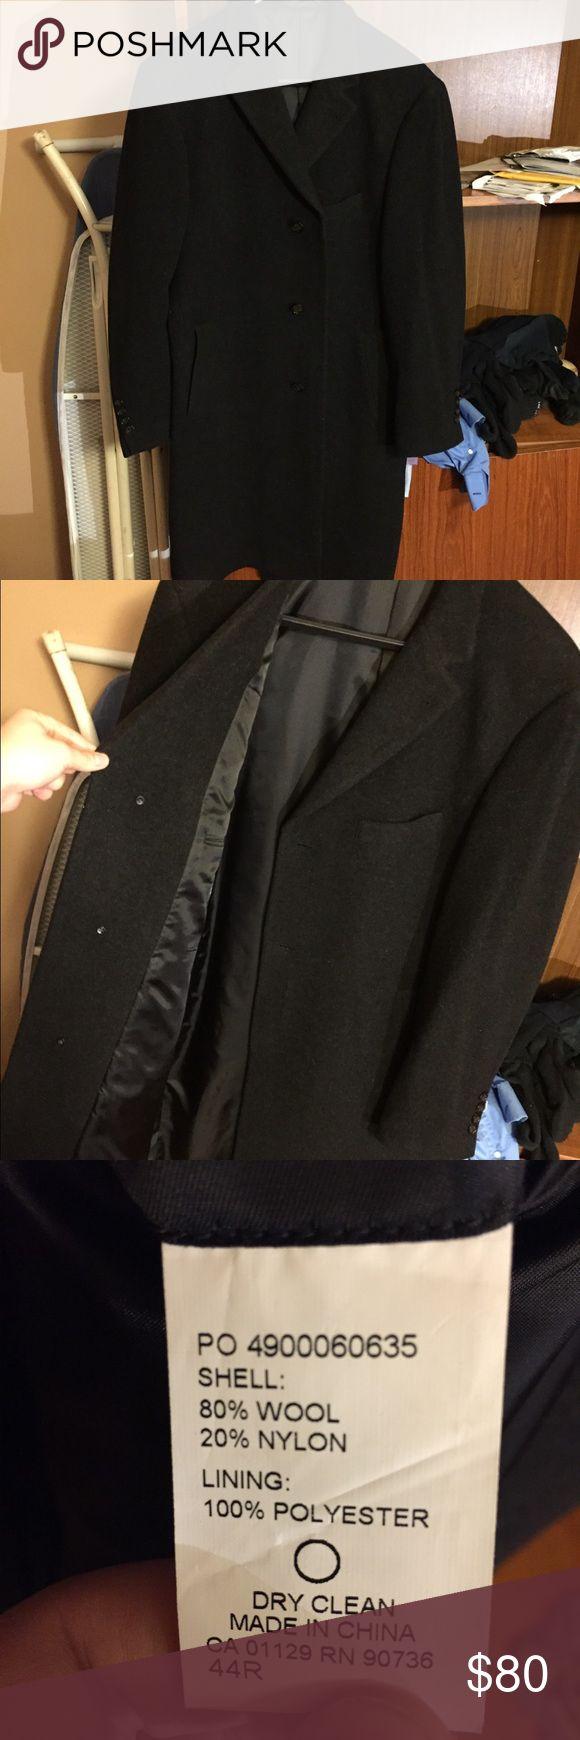 Ralph Lauren Topcoat Wool Overcoat Very nice Ralph Lauren Men's Topcoat Wool Blend Columbia Overcoat. Size 44R. Worn twice. Perfect condition. Brand new, without the tag. Color is Charcoal. :) Lauren Ralph Lauren Jackets & Coats Pea Coats